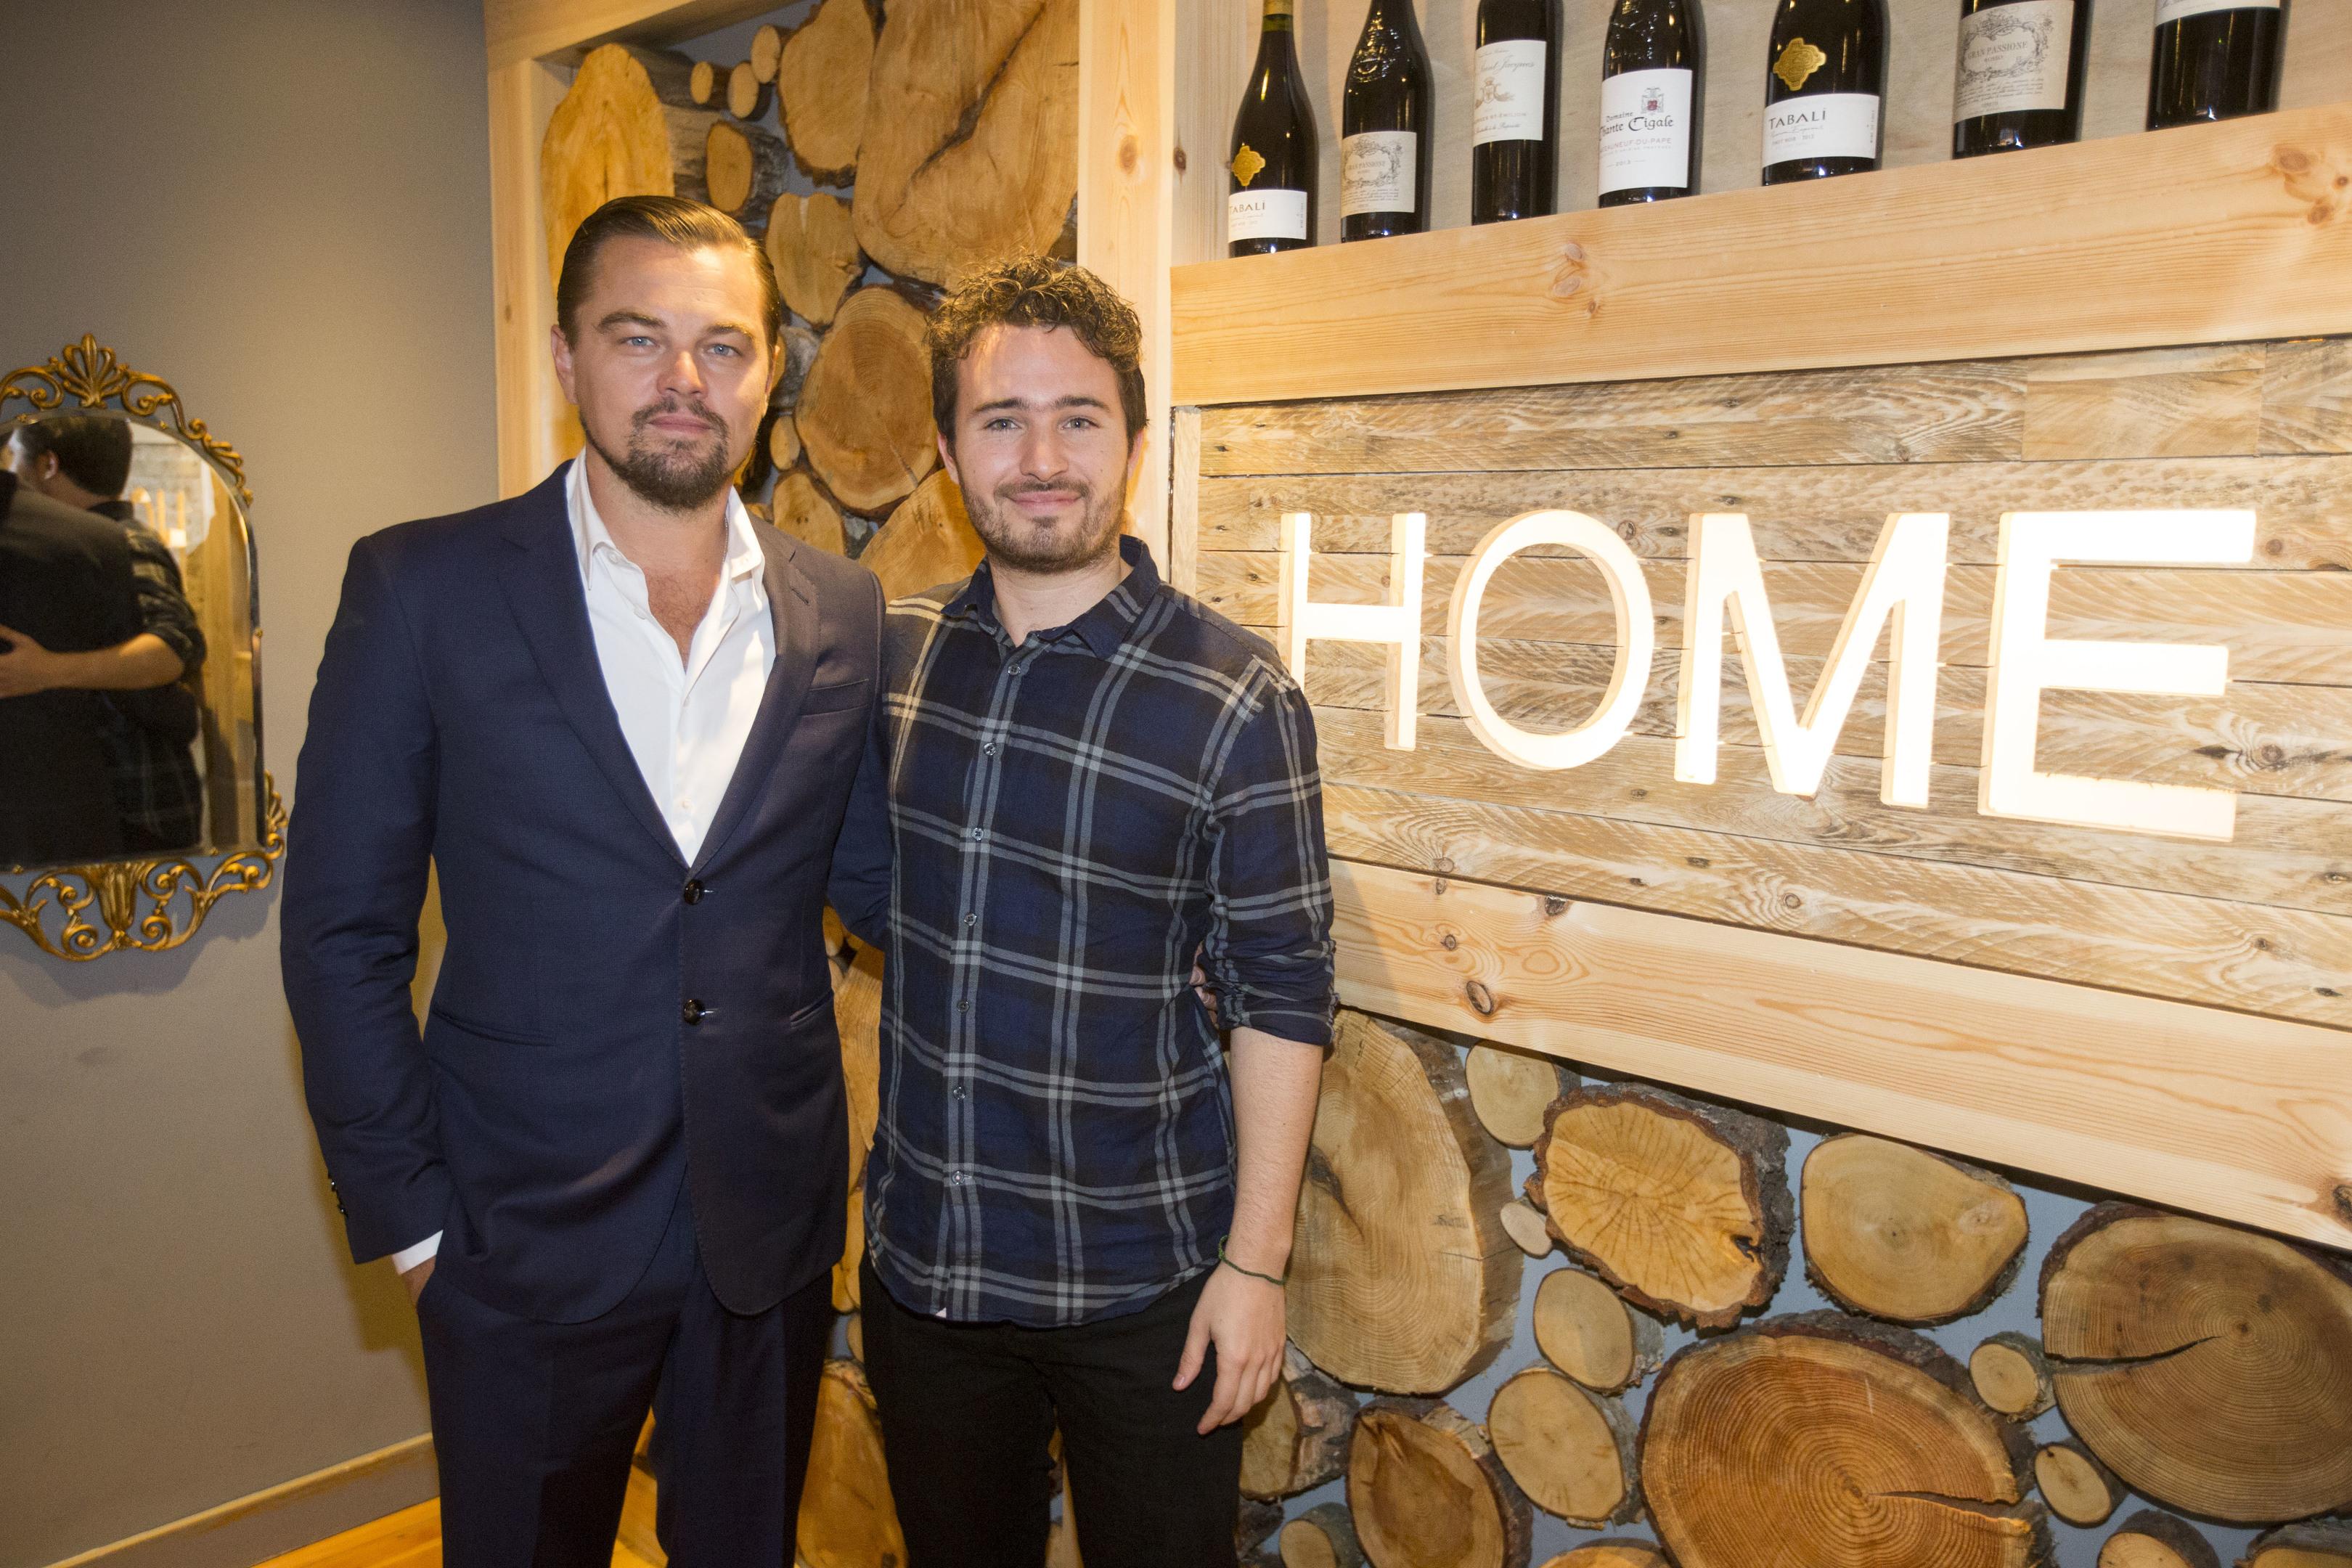 Leonardo DiCaprio with social entrepreneur Josh Littlejohn at Social Bite restaurant, Home, in Edinburgh, Scotland.